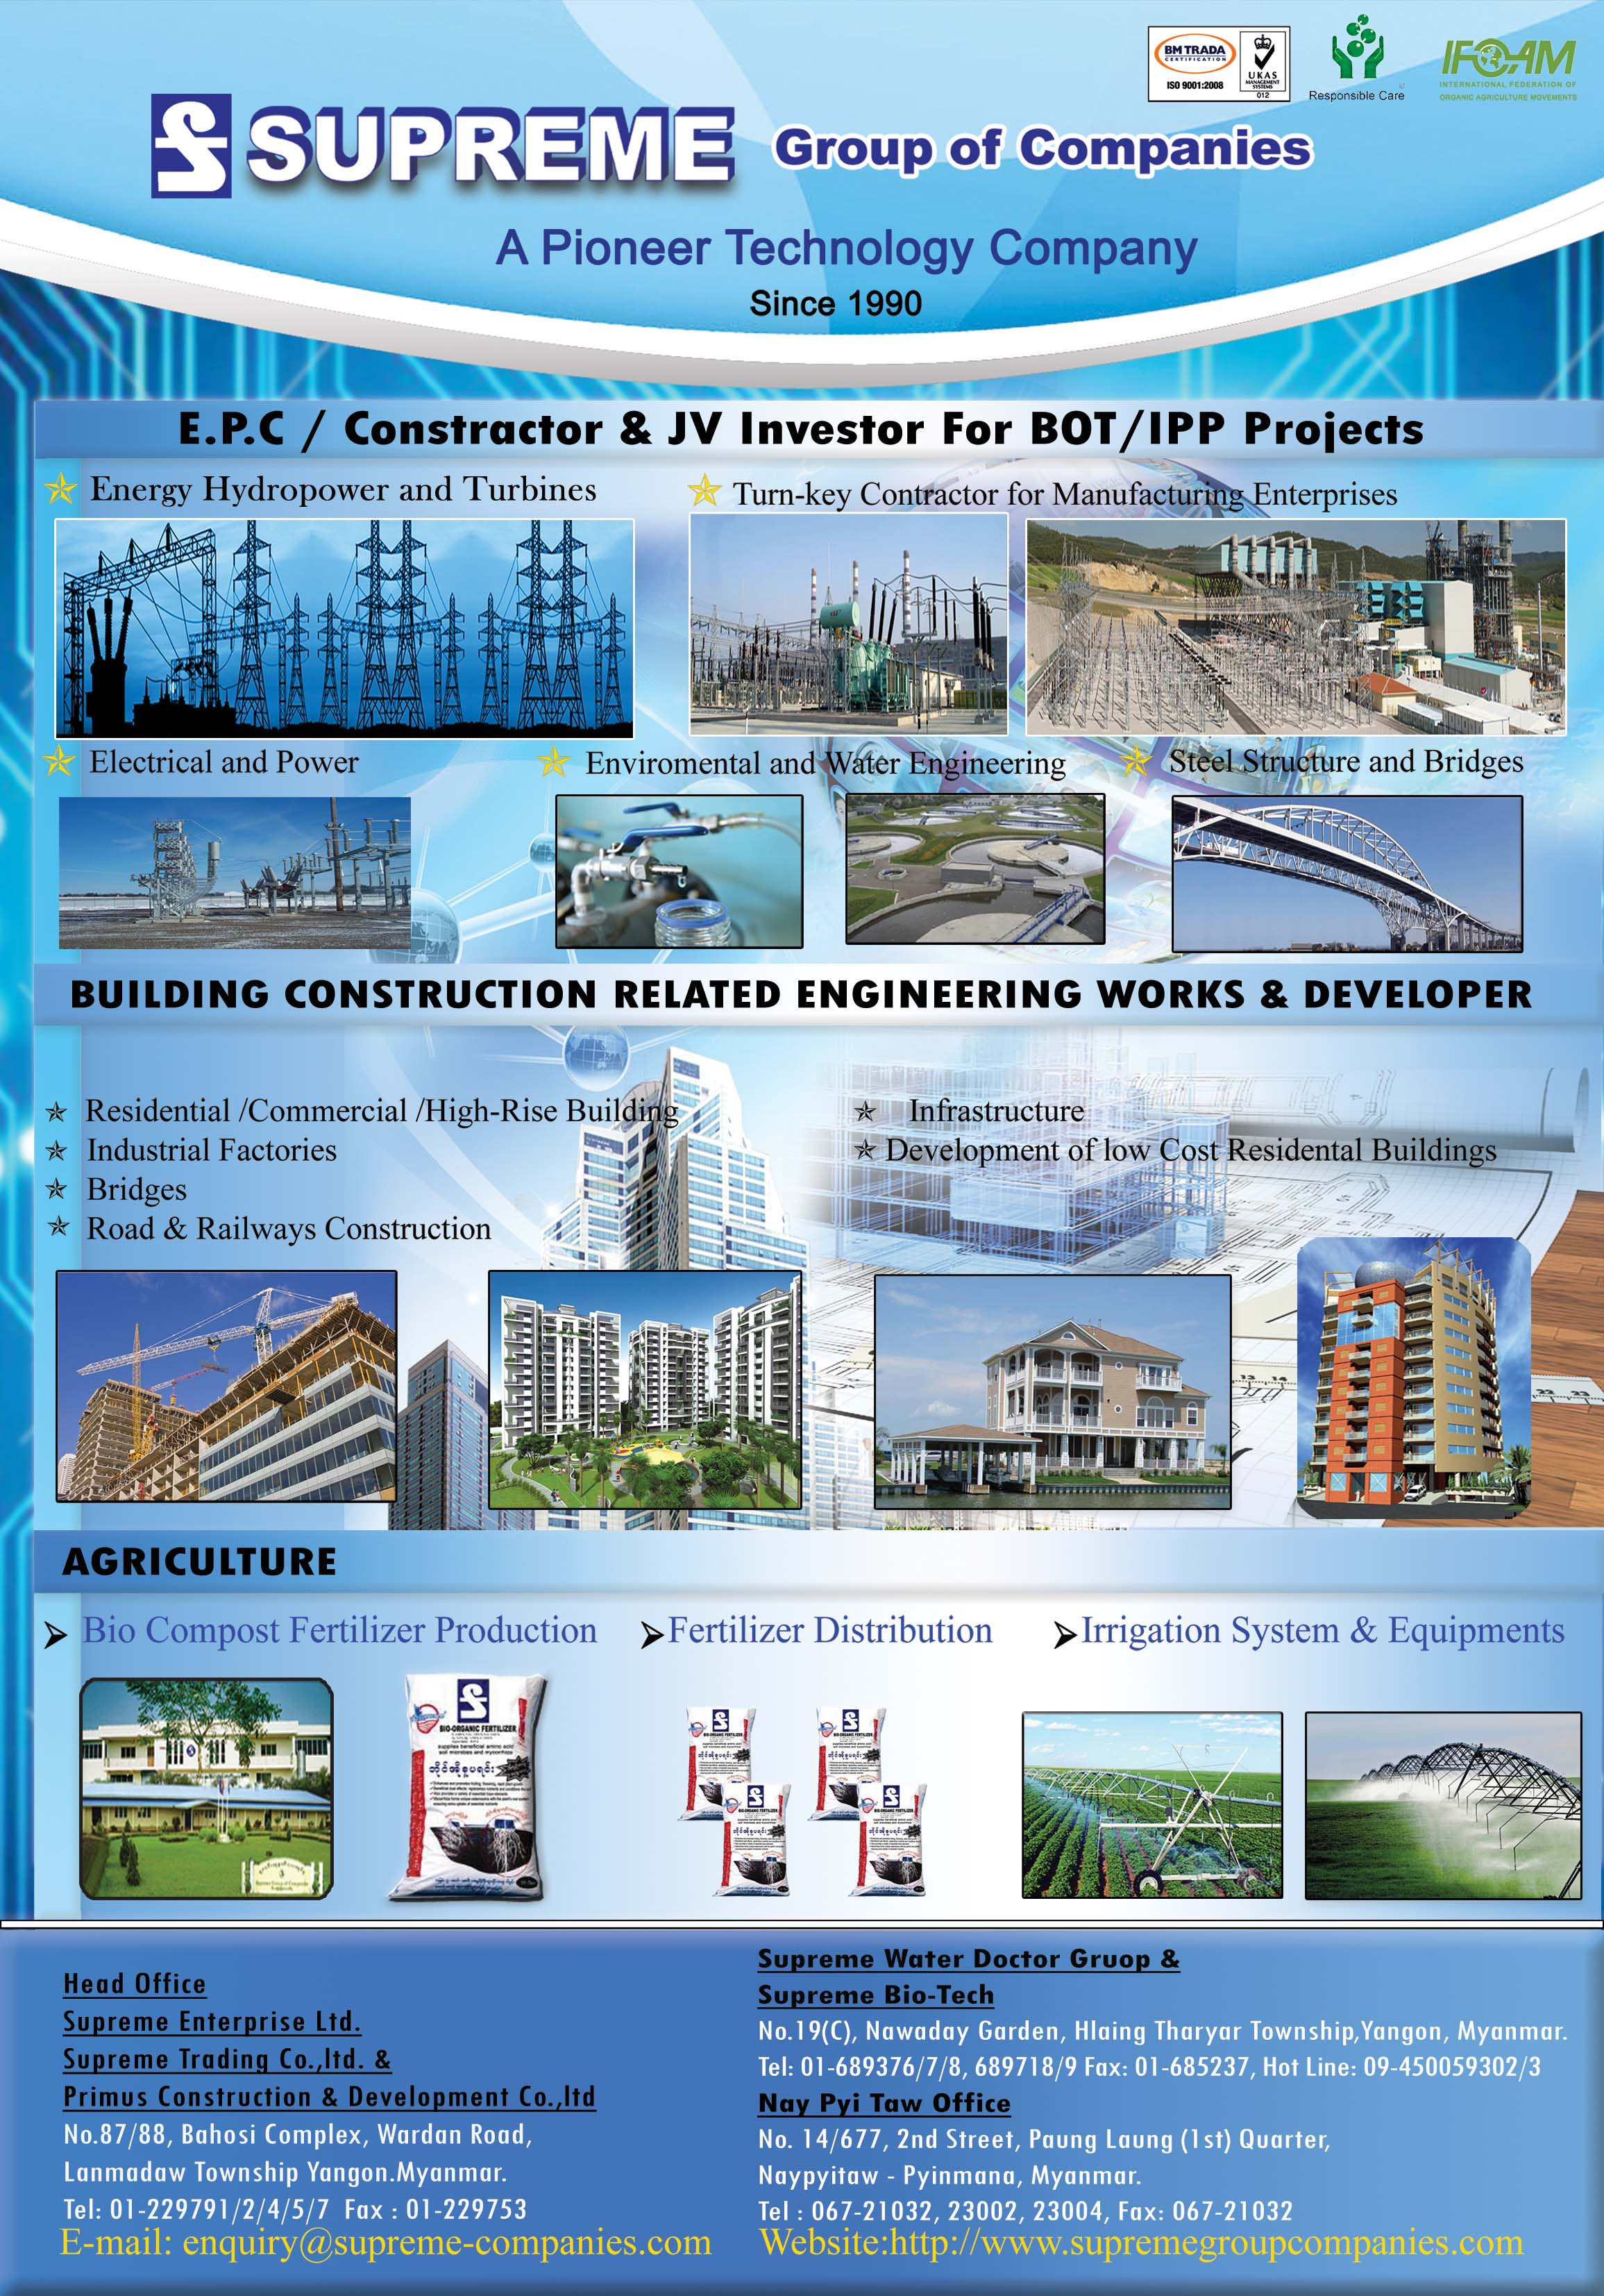 Supreme Group of Companies (Supreme Enterprise Ltd.)